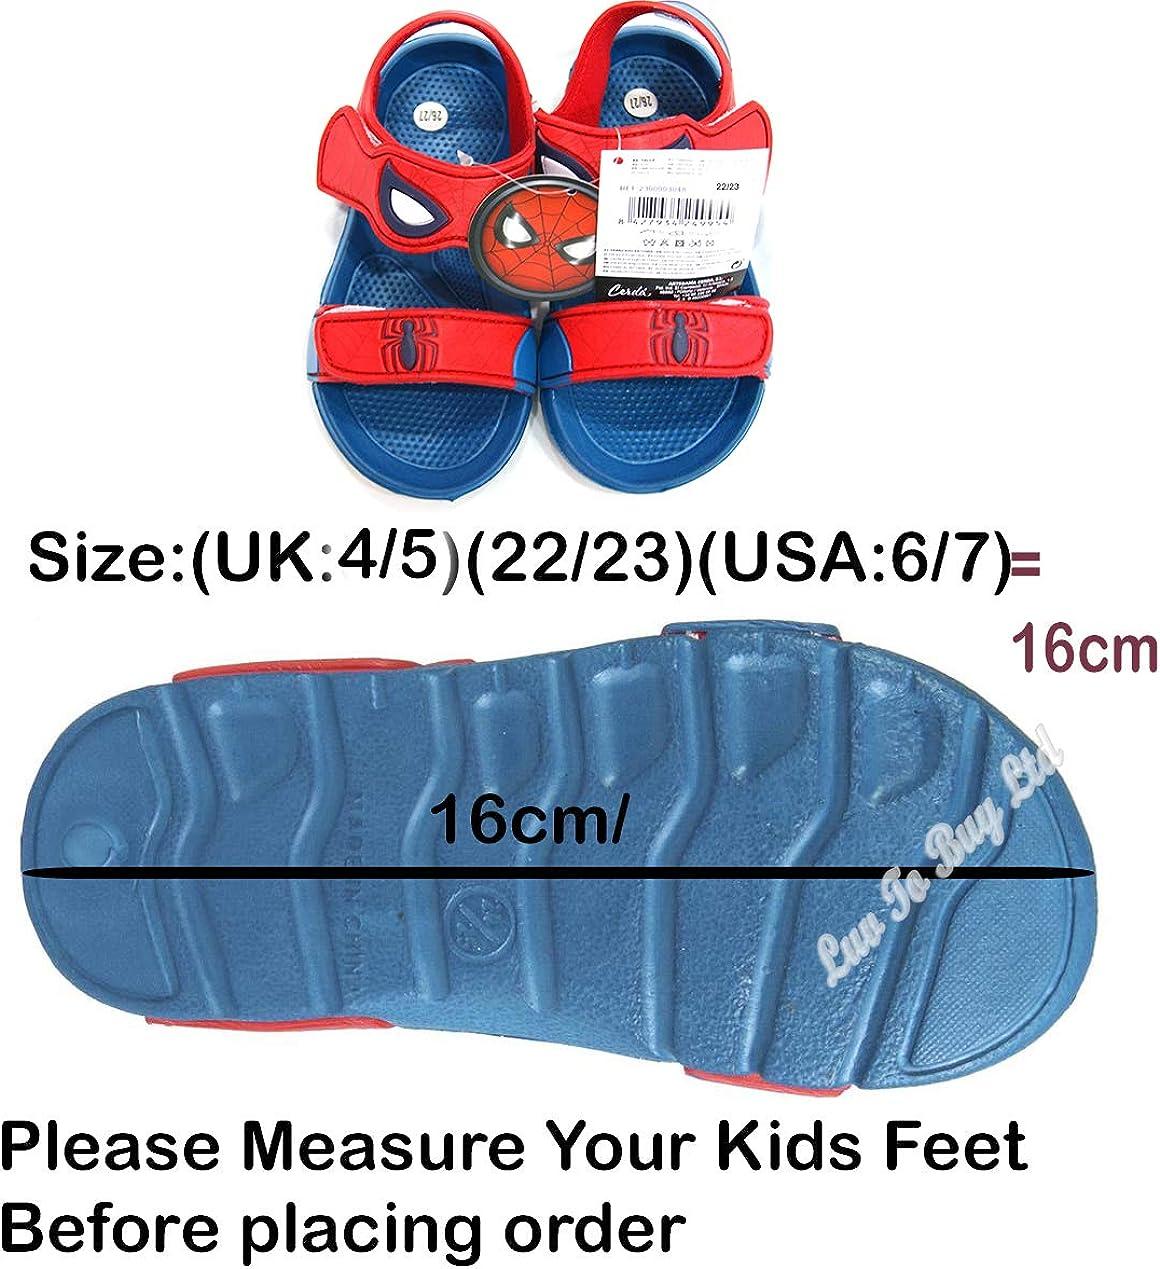 Rojo Azul 23 EU Sandale Plate Mixte Enfant SANDALIAS S0710155